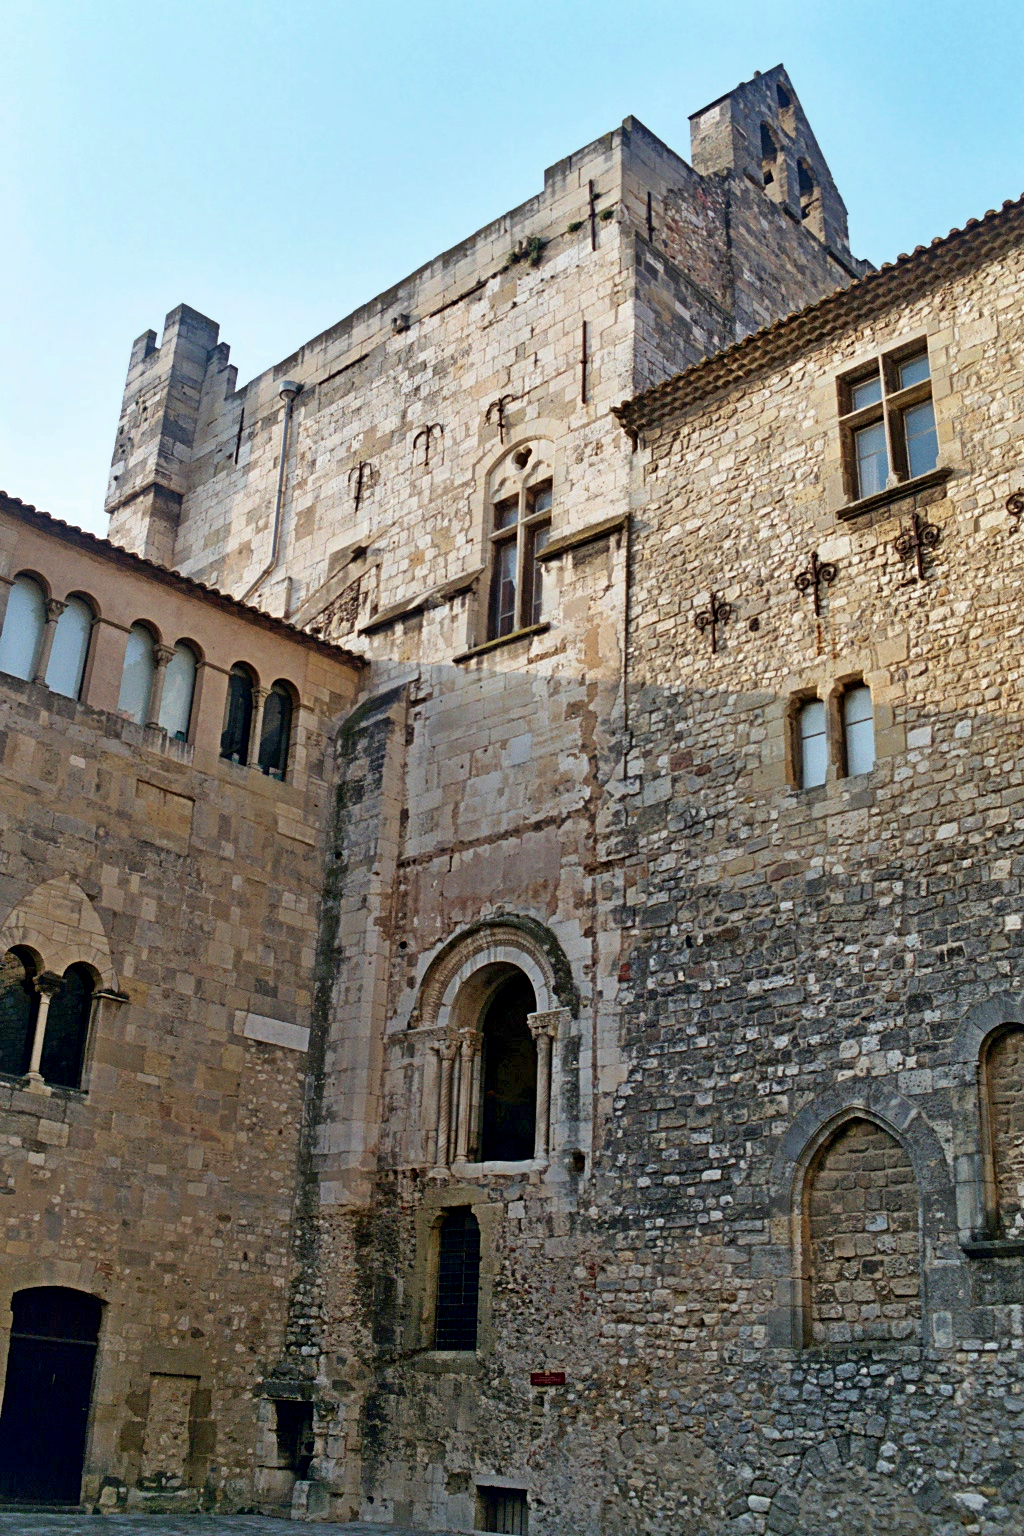 Narbonne Version 3 1: File:Chapelle De La Madeleine (Narbonne) 1.JPG